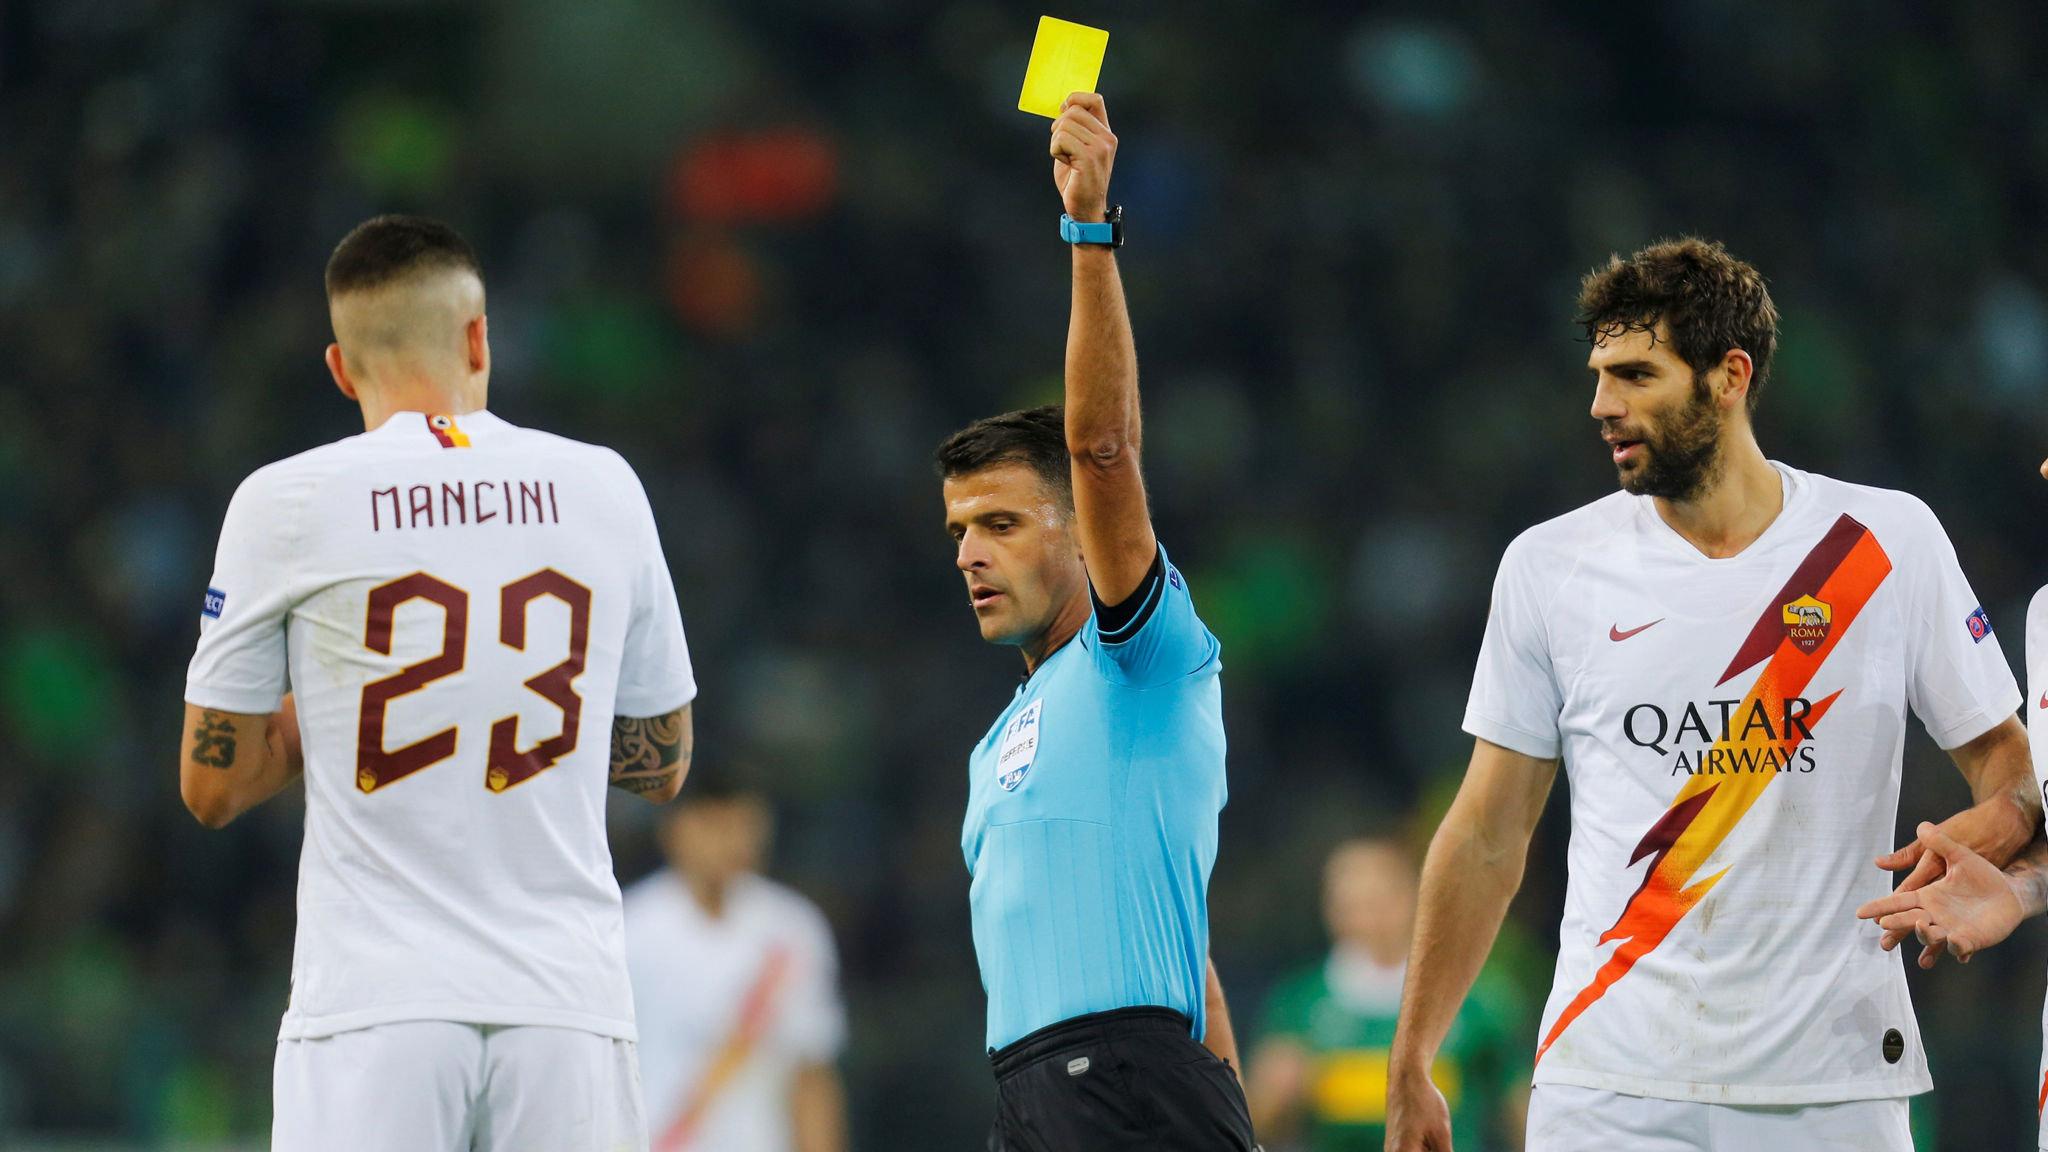 Italian football club AS Roma in talks over possible sale